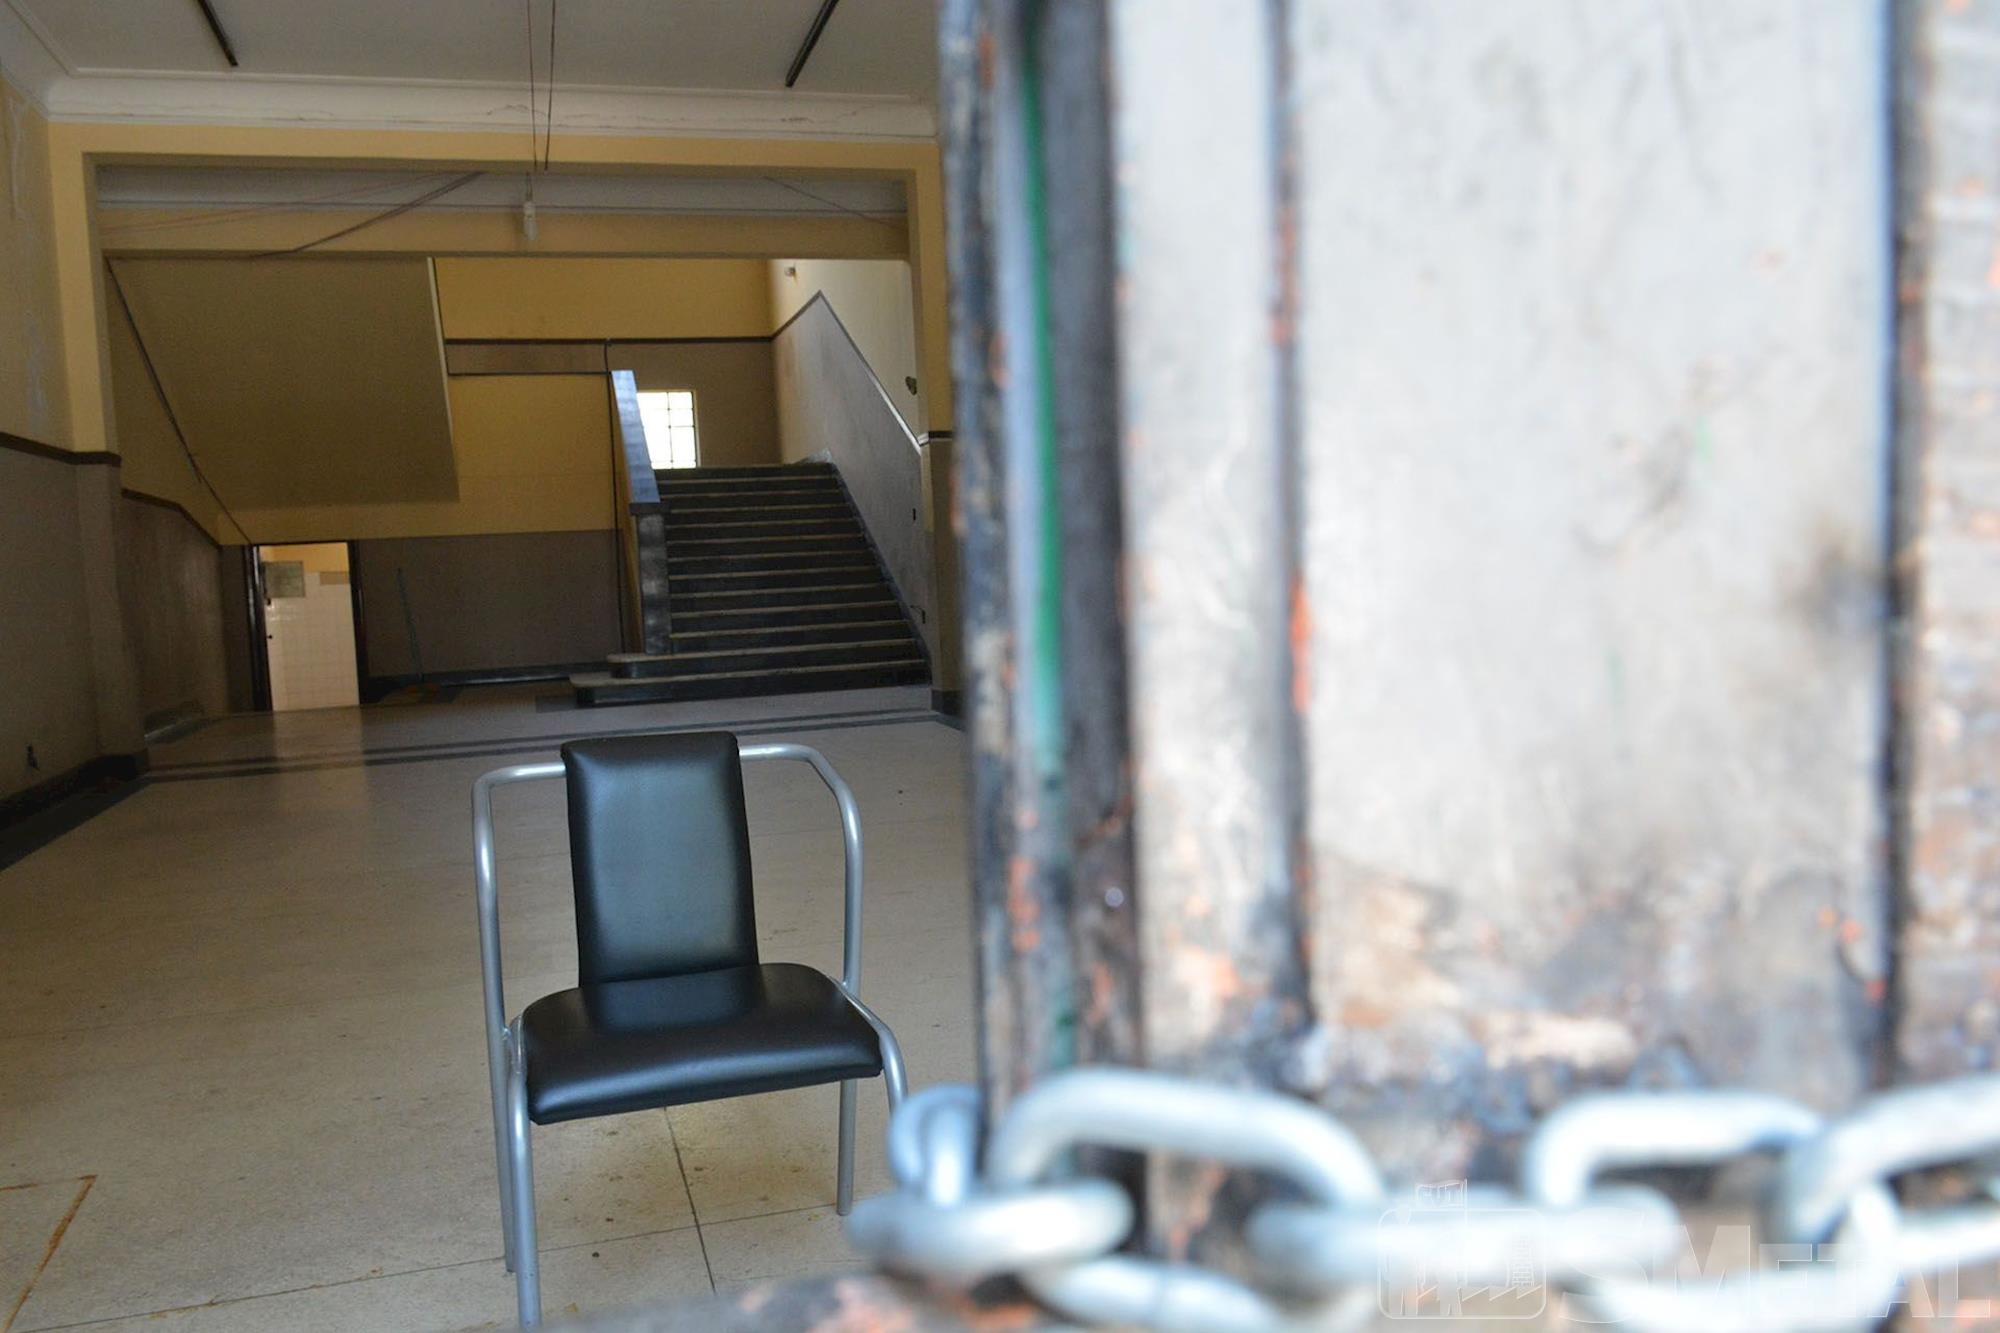 , oficina, protesto, otelo, sorocaba, , Foguinho/Imprensa SMetal